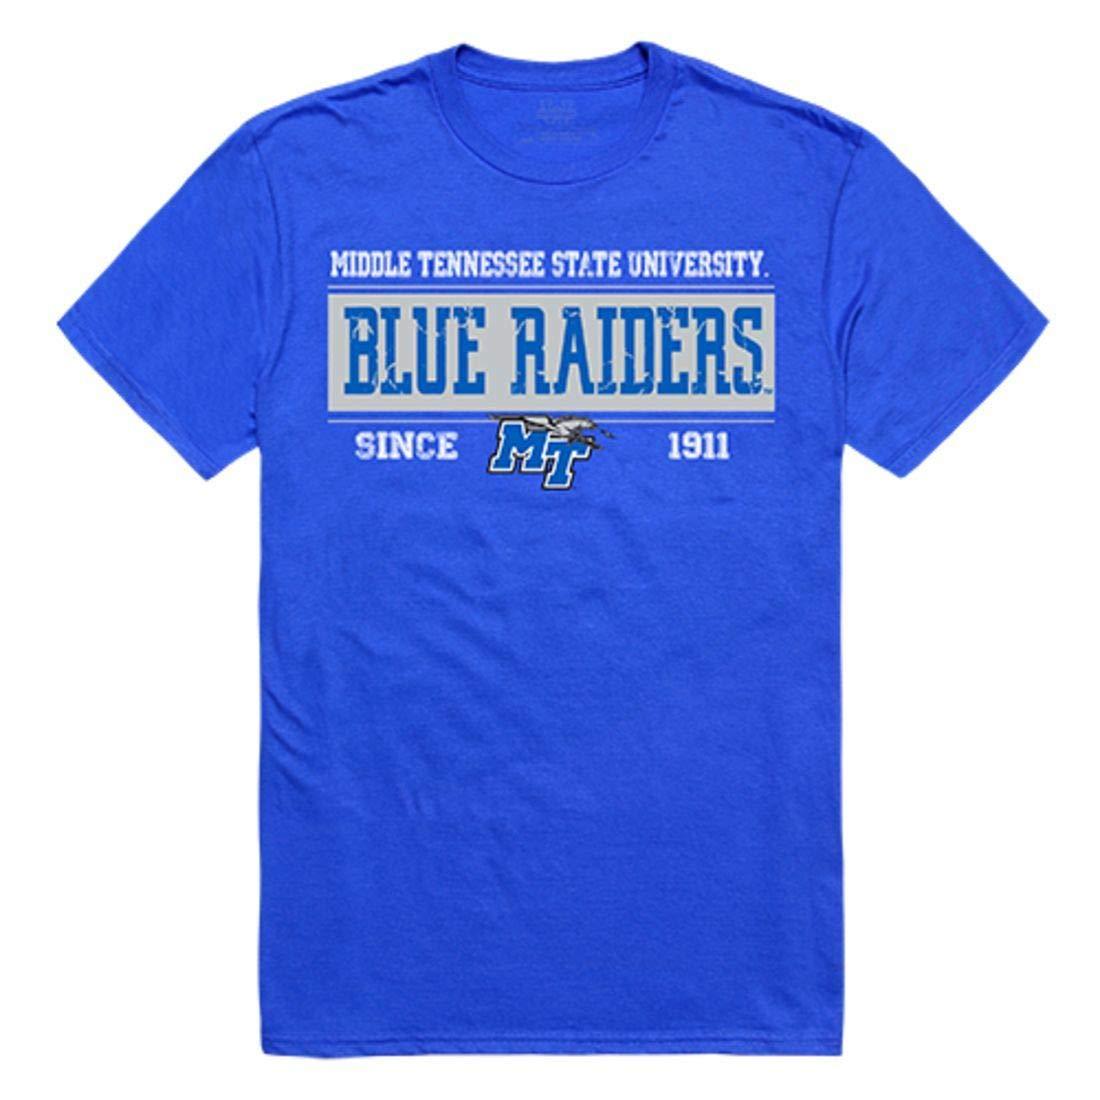 Mtsu Middle Tennessee State University Blue Raiders Established Tees T Shirt Royal